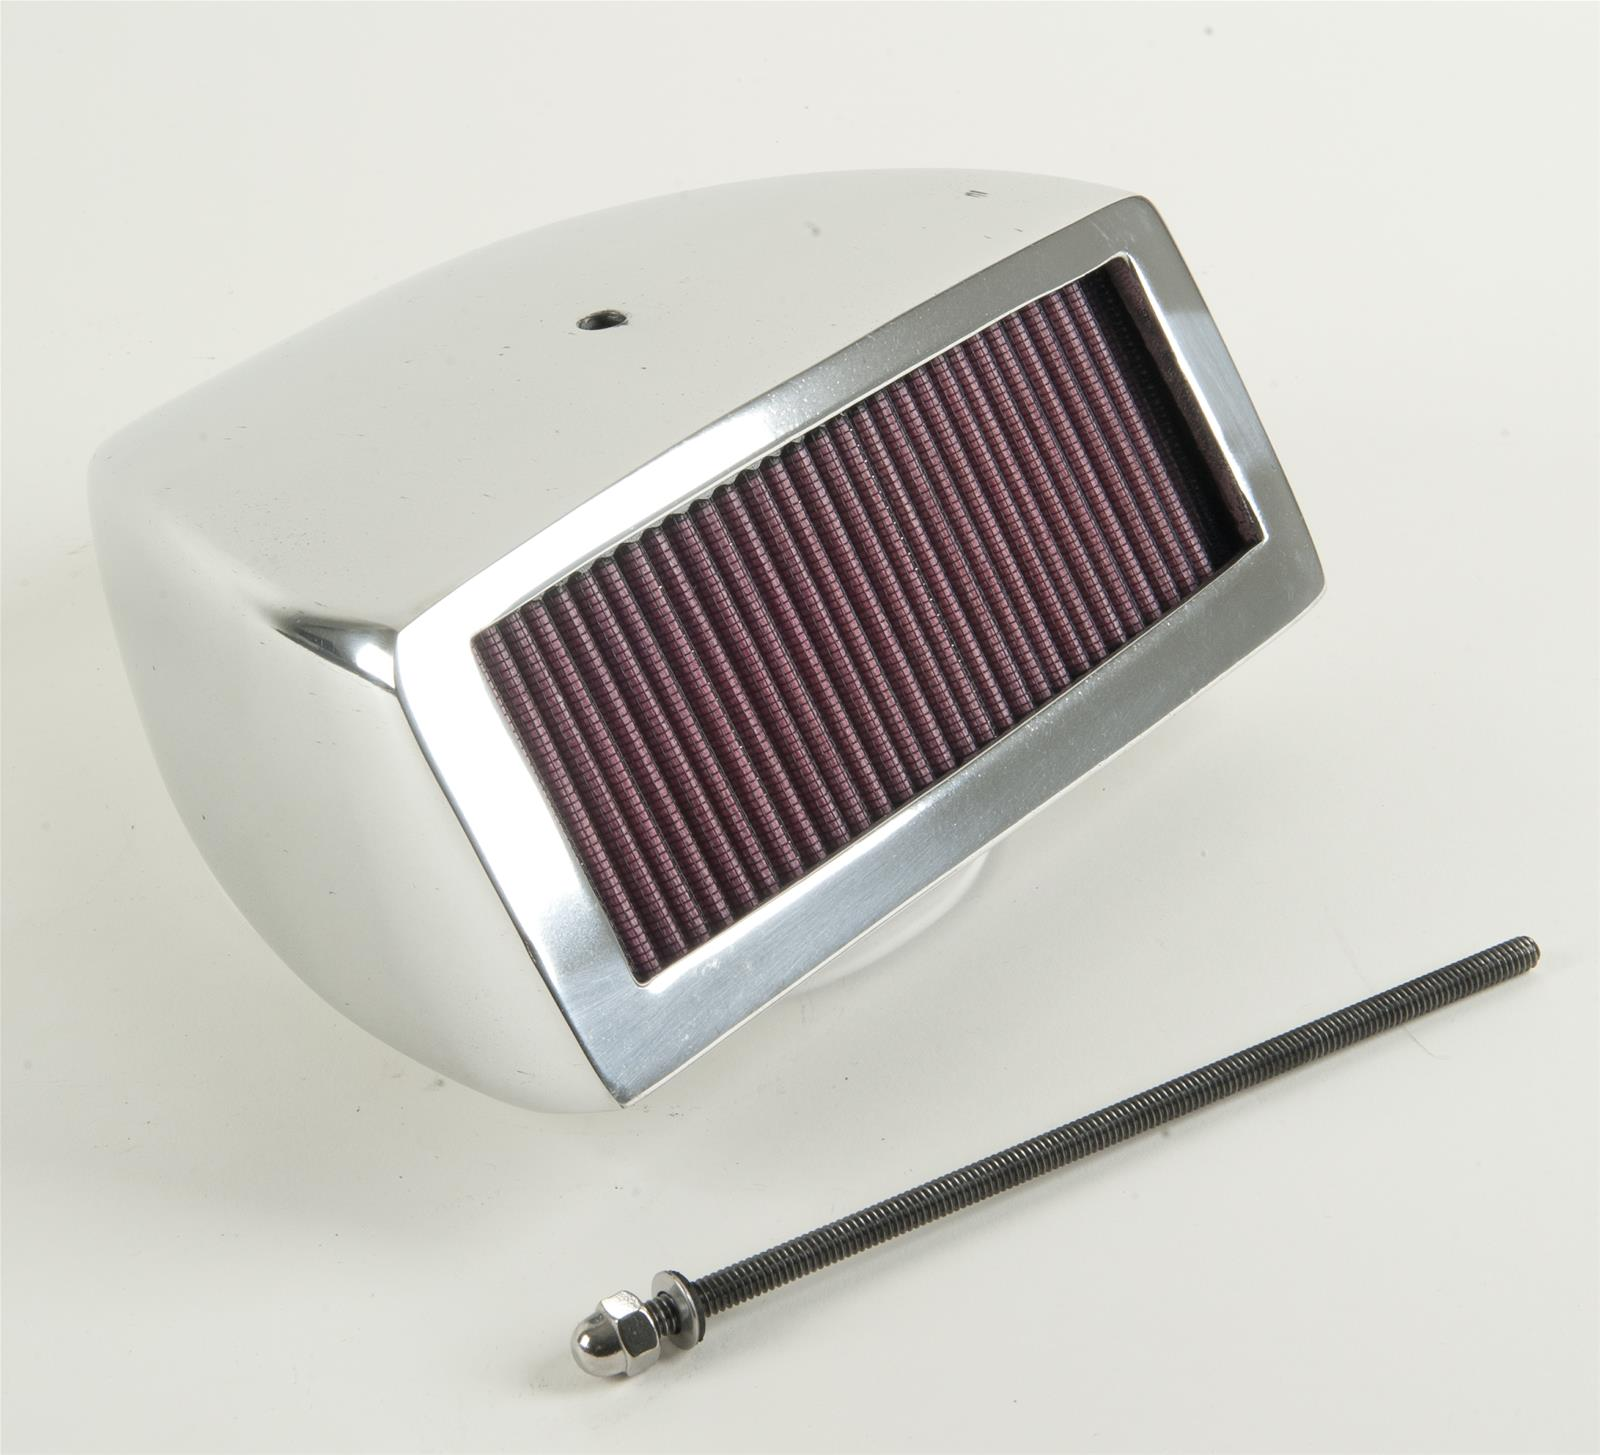 Cal Custom Air Cleaner : Cal custom™ spark arrestor style air cleaners o